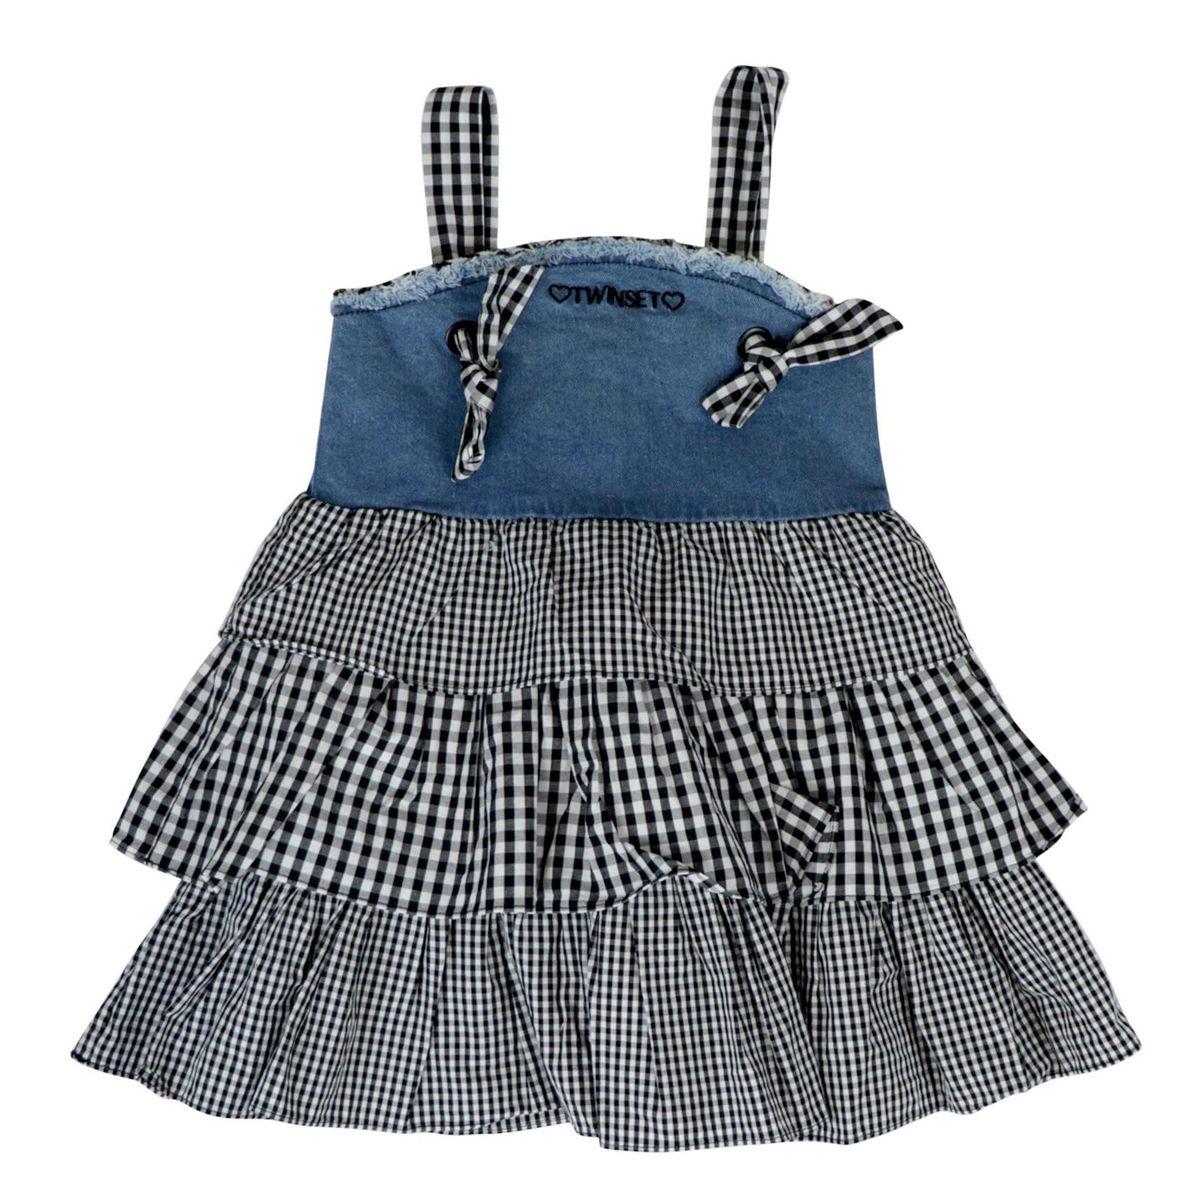 Denim dress with flounced skirt in cotton with vichy pattern Medium denim Twin-Set